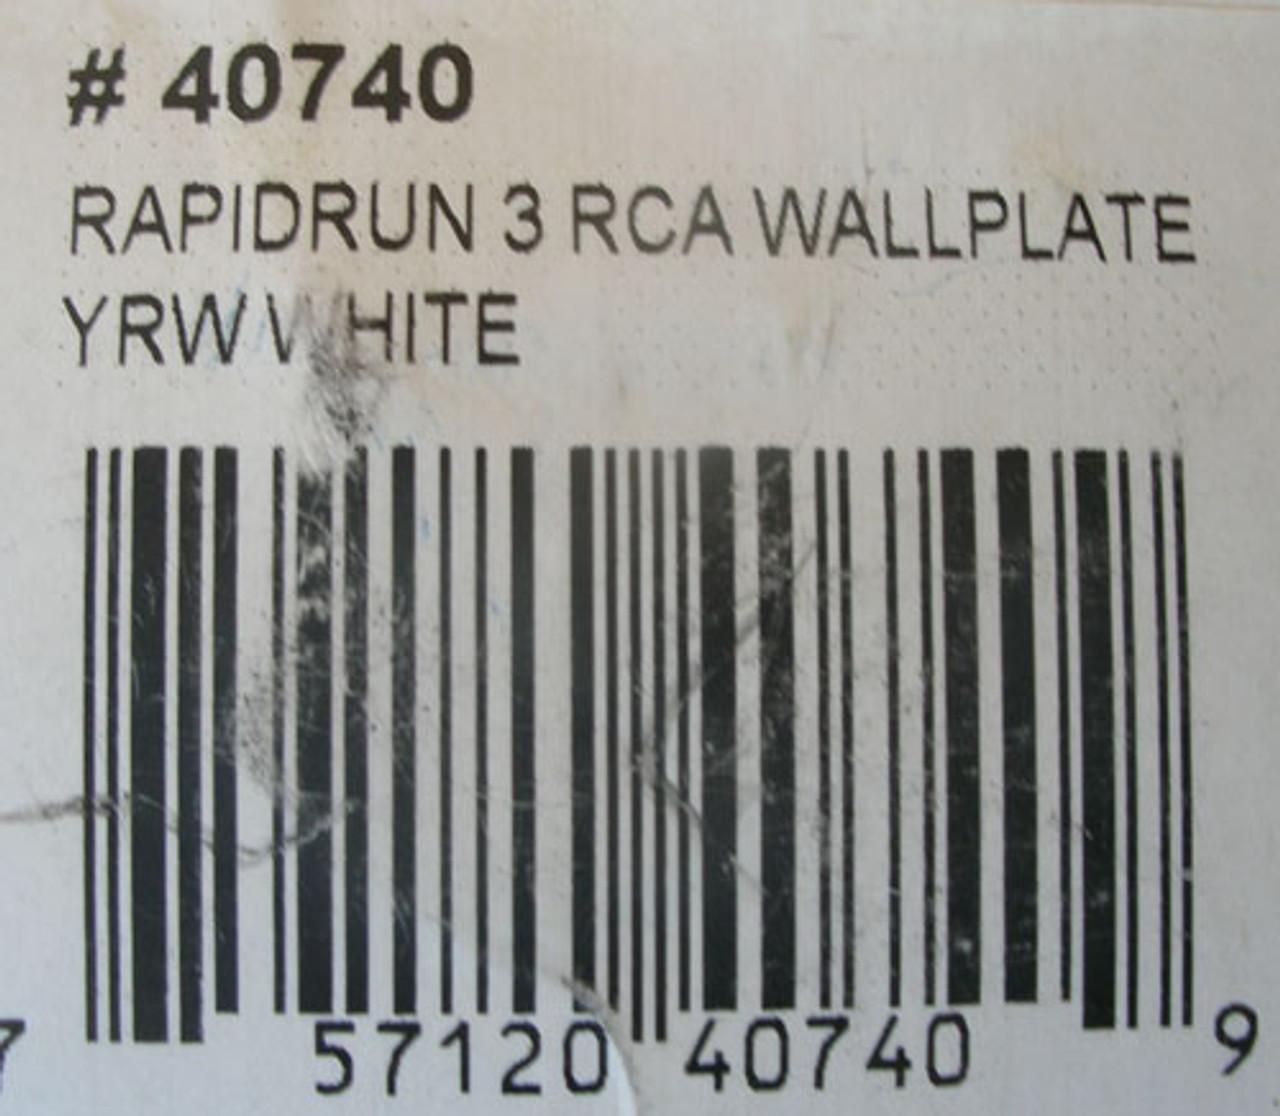 RapidRun 40740 3 RCA Composite Video+Stereo Audio Wall Plate, White - New